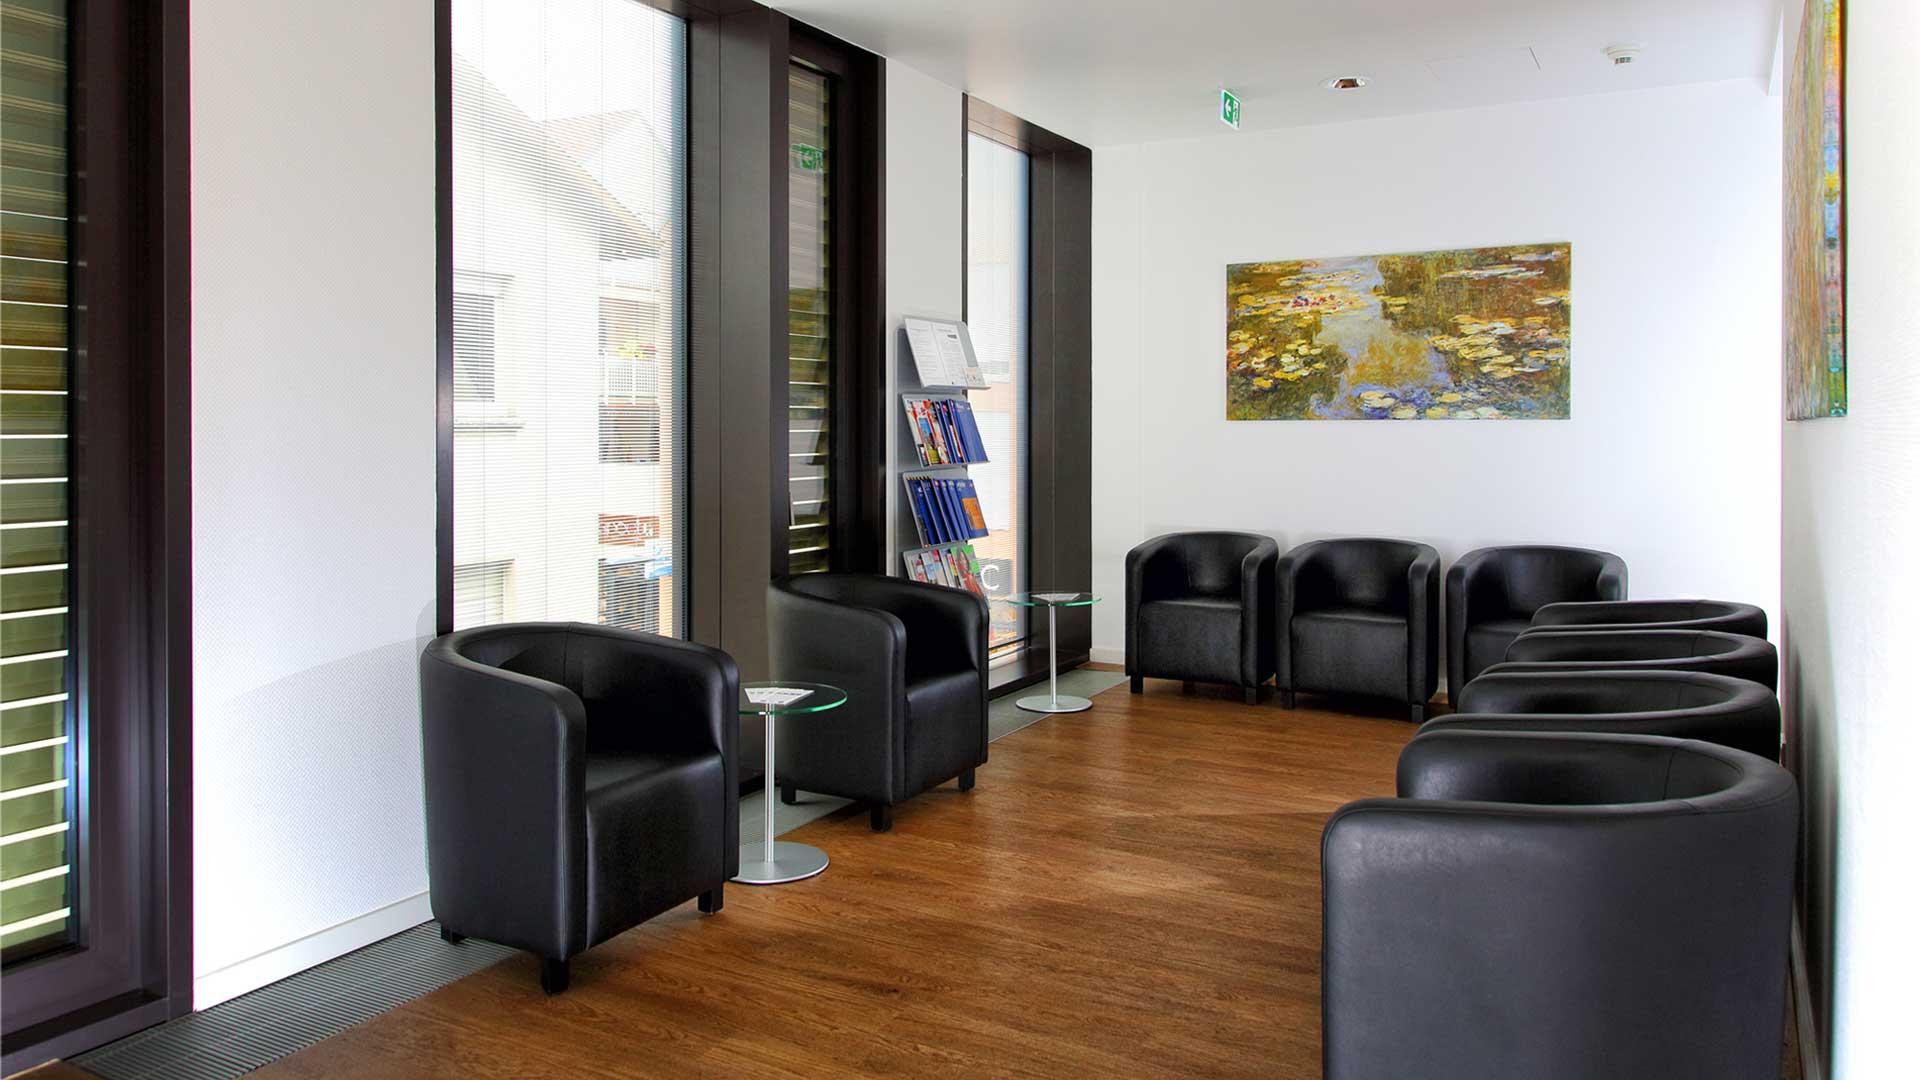 Kardiocentrum Frankfurt Praxis Bad Vilbel, Niddaplatz, Wartebereich